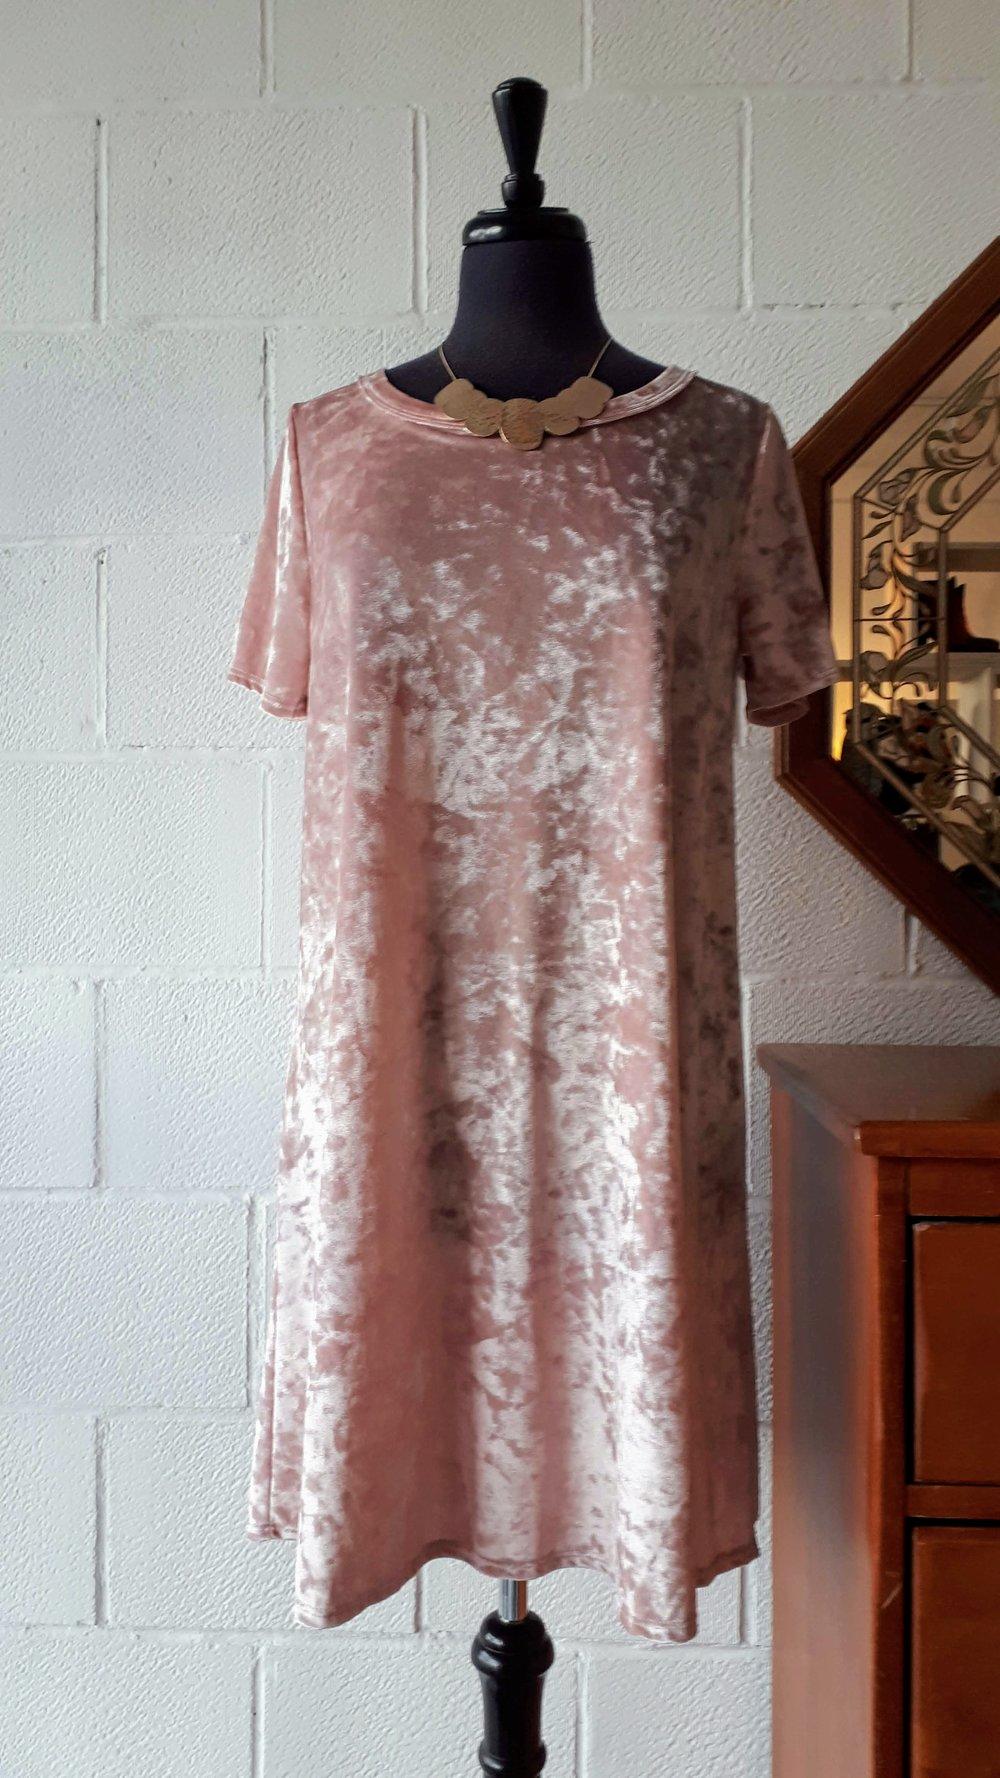 Workhall dress (NWT); Size L, $62